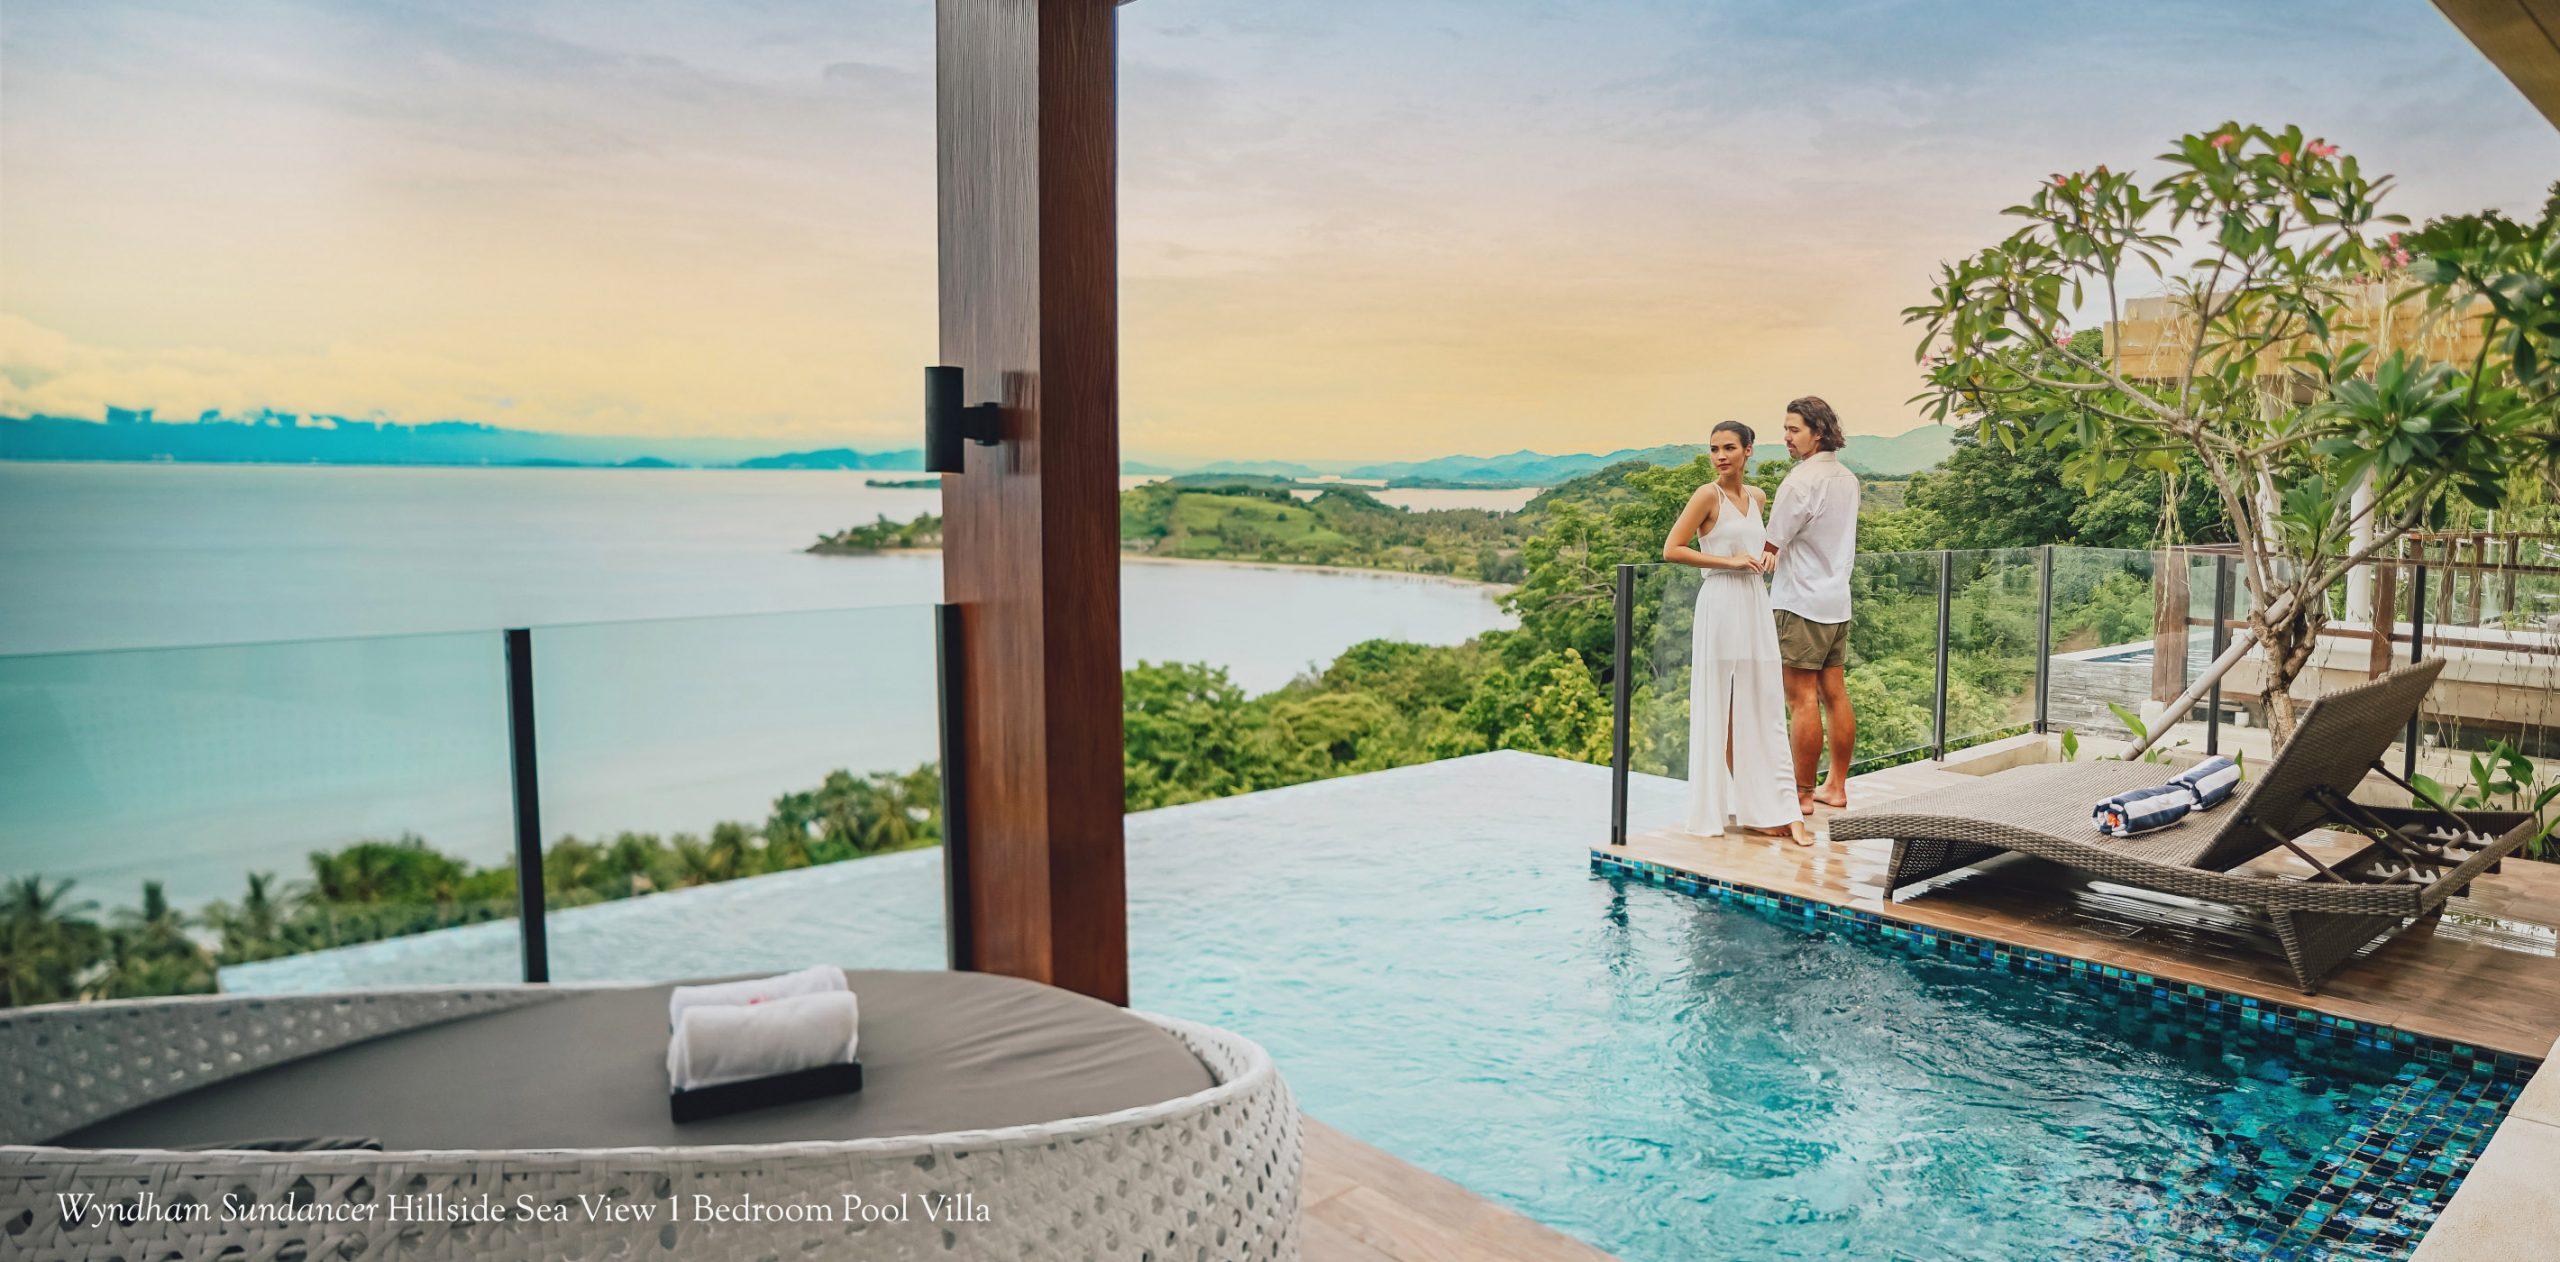 Wyndham Sundancer Hillside Sea View 1 Bedroom Pool Villa